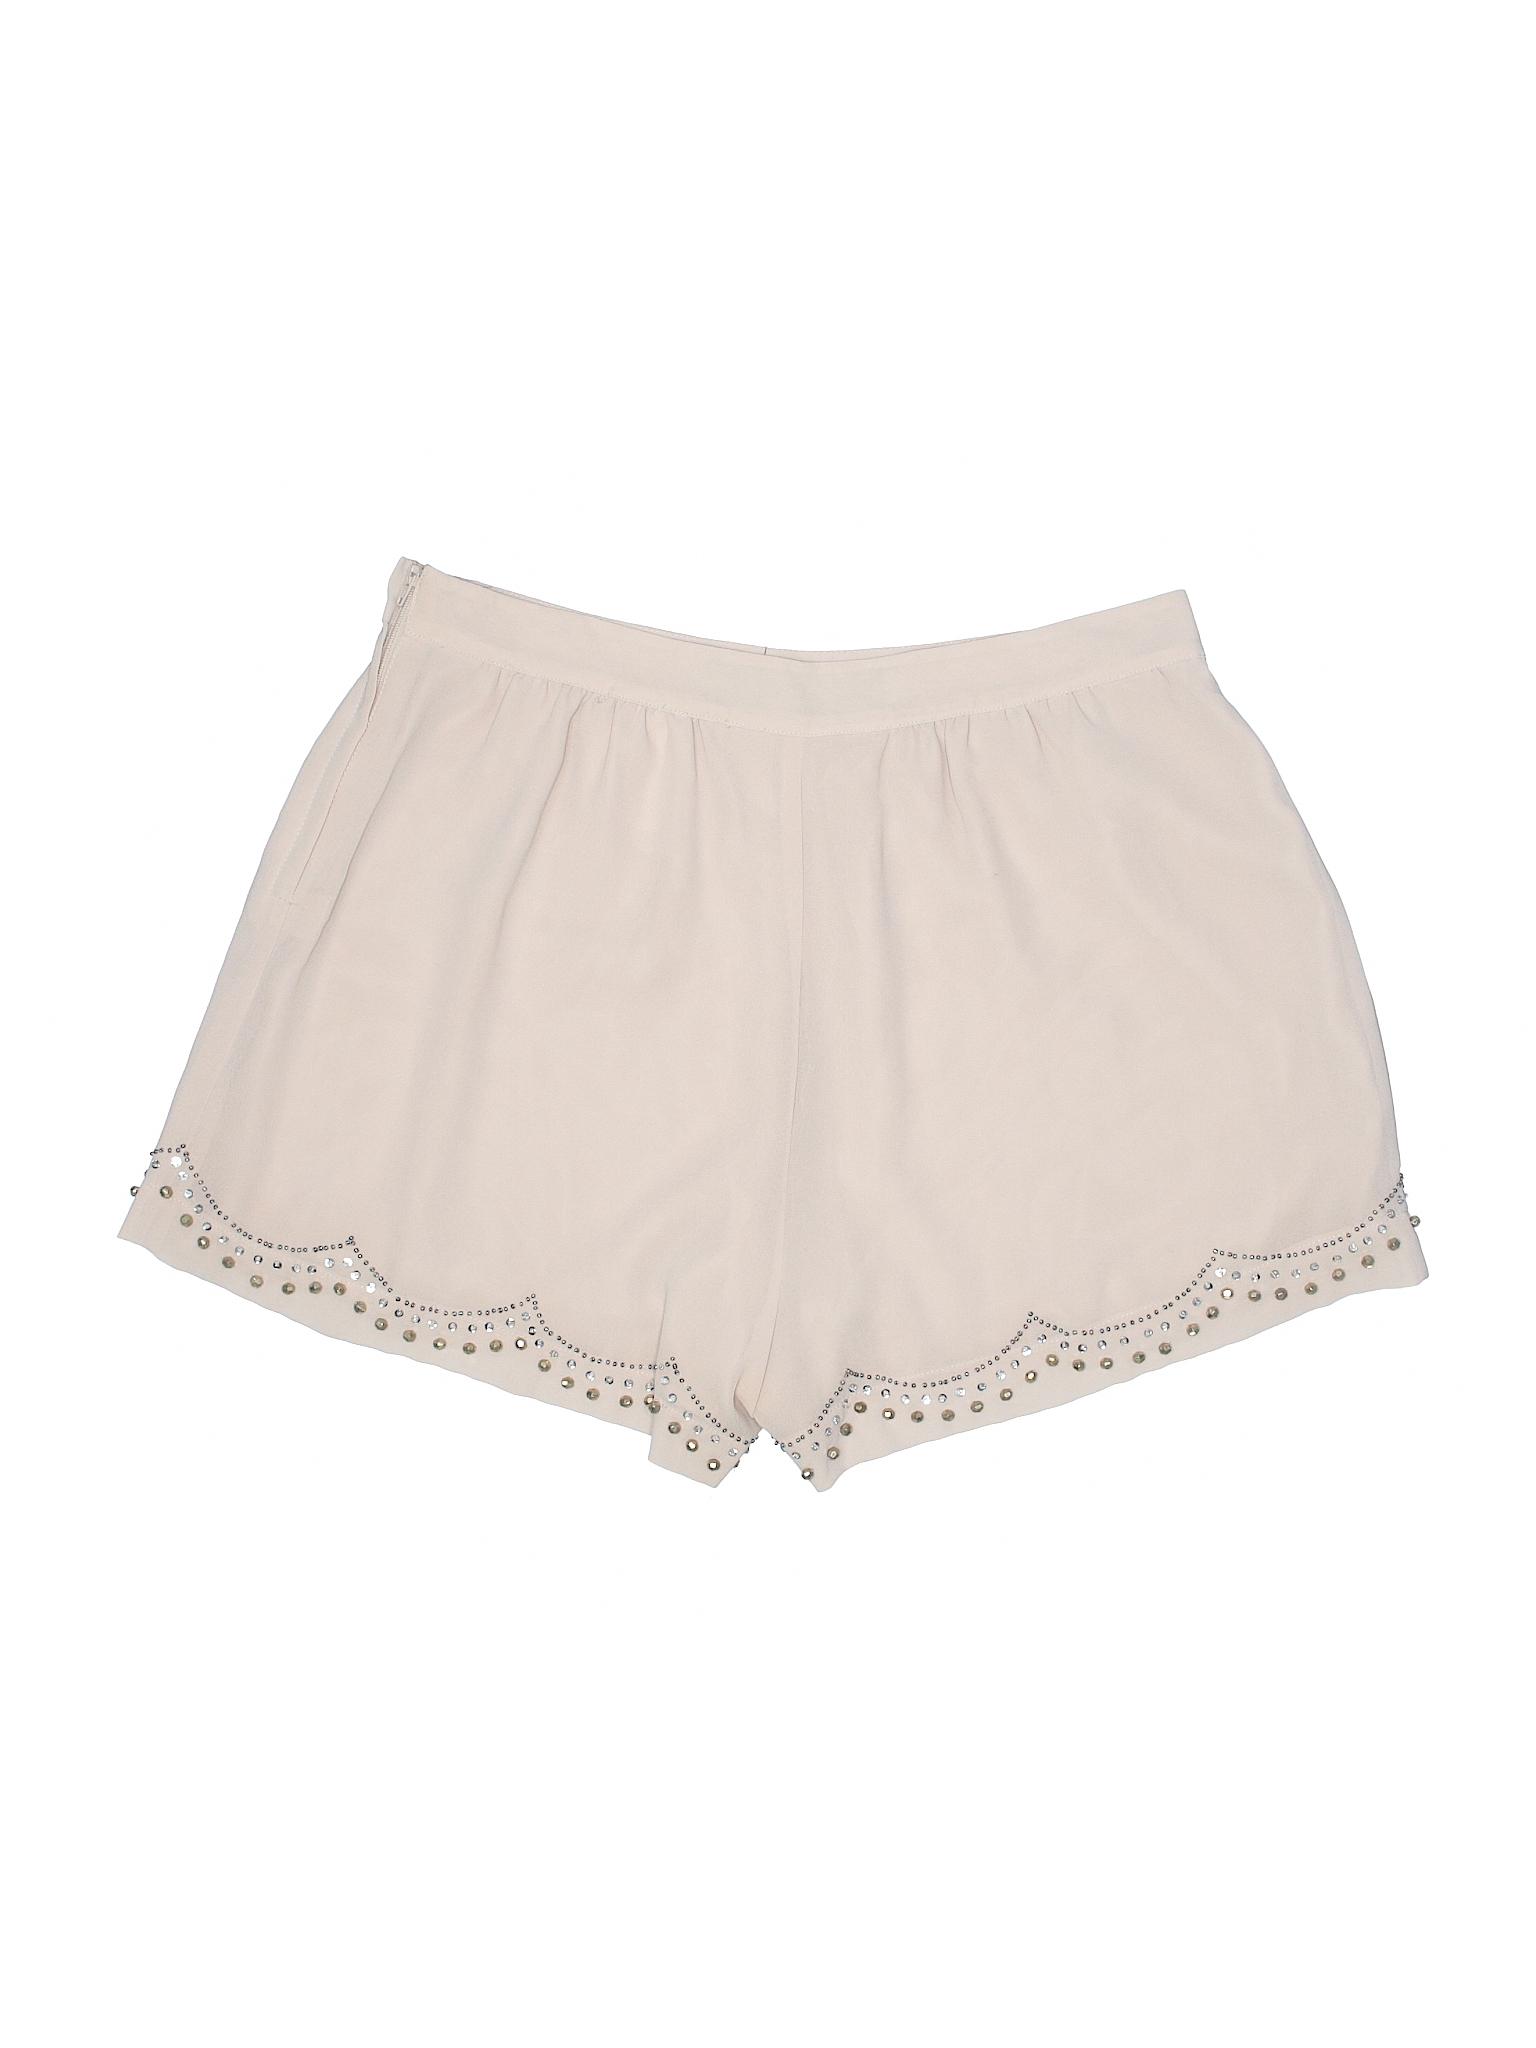 amp;M H Dressy leisure Shorts Boutique BUx8ZW